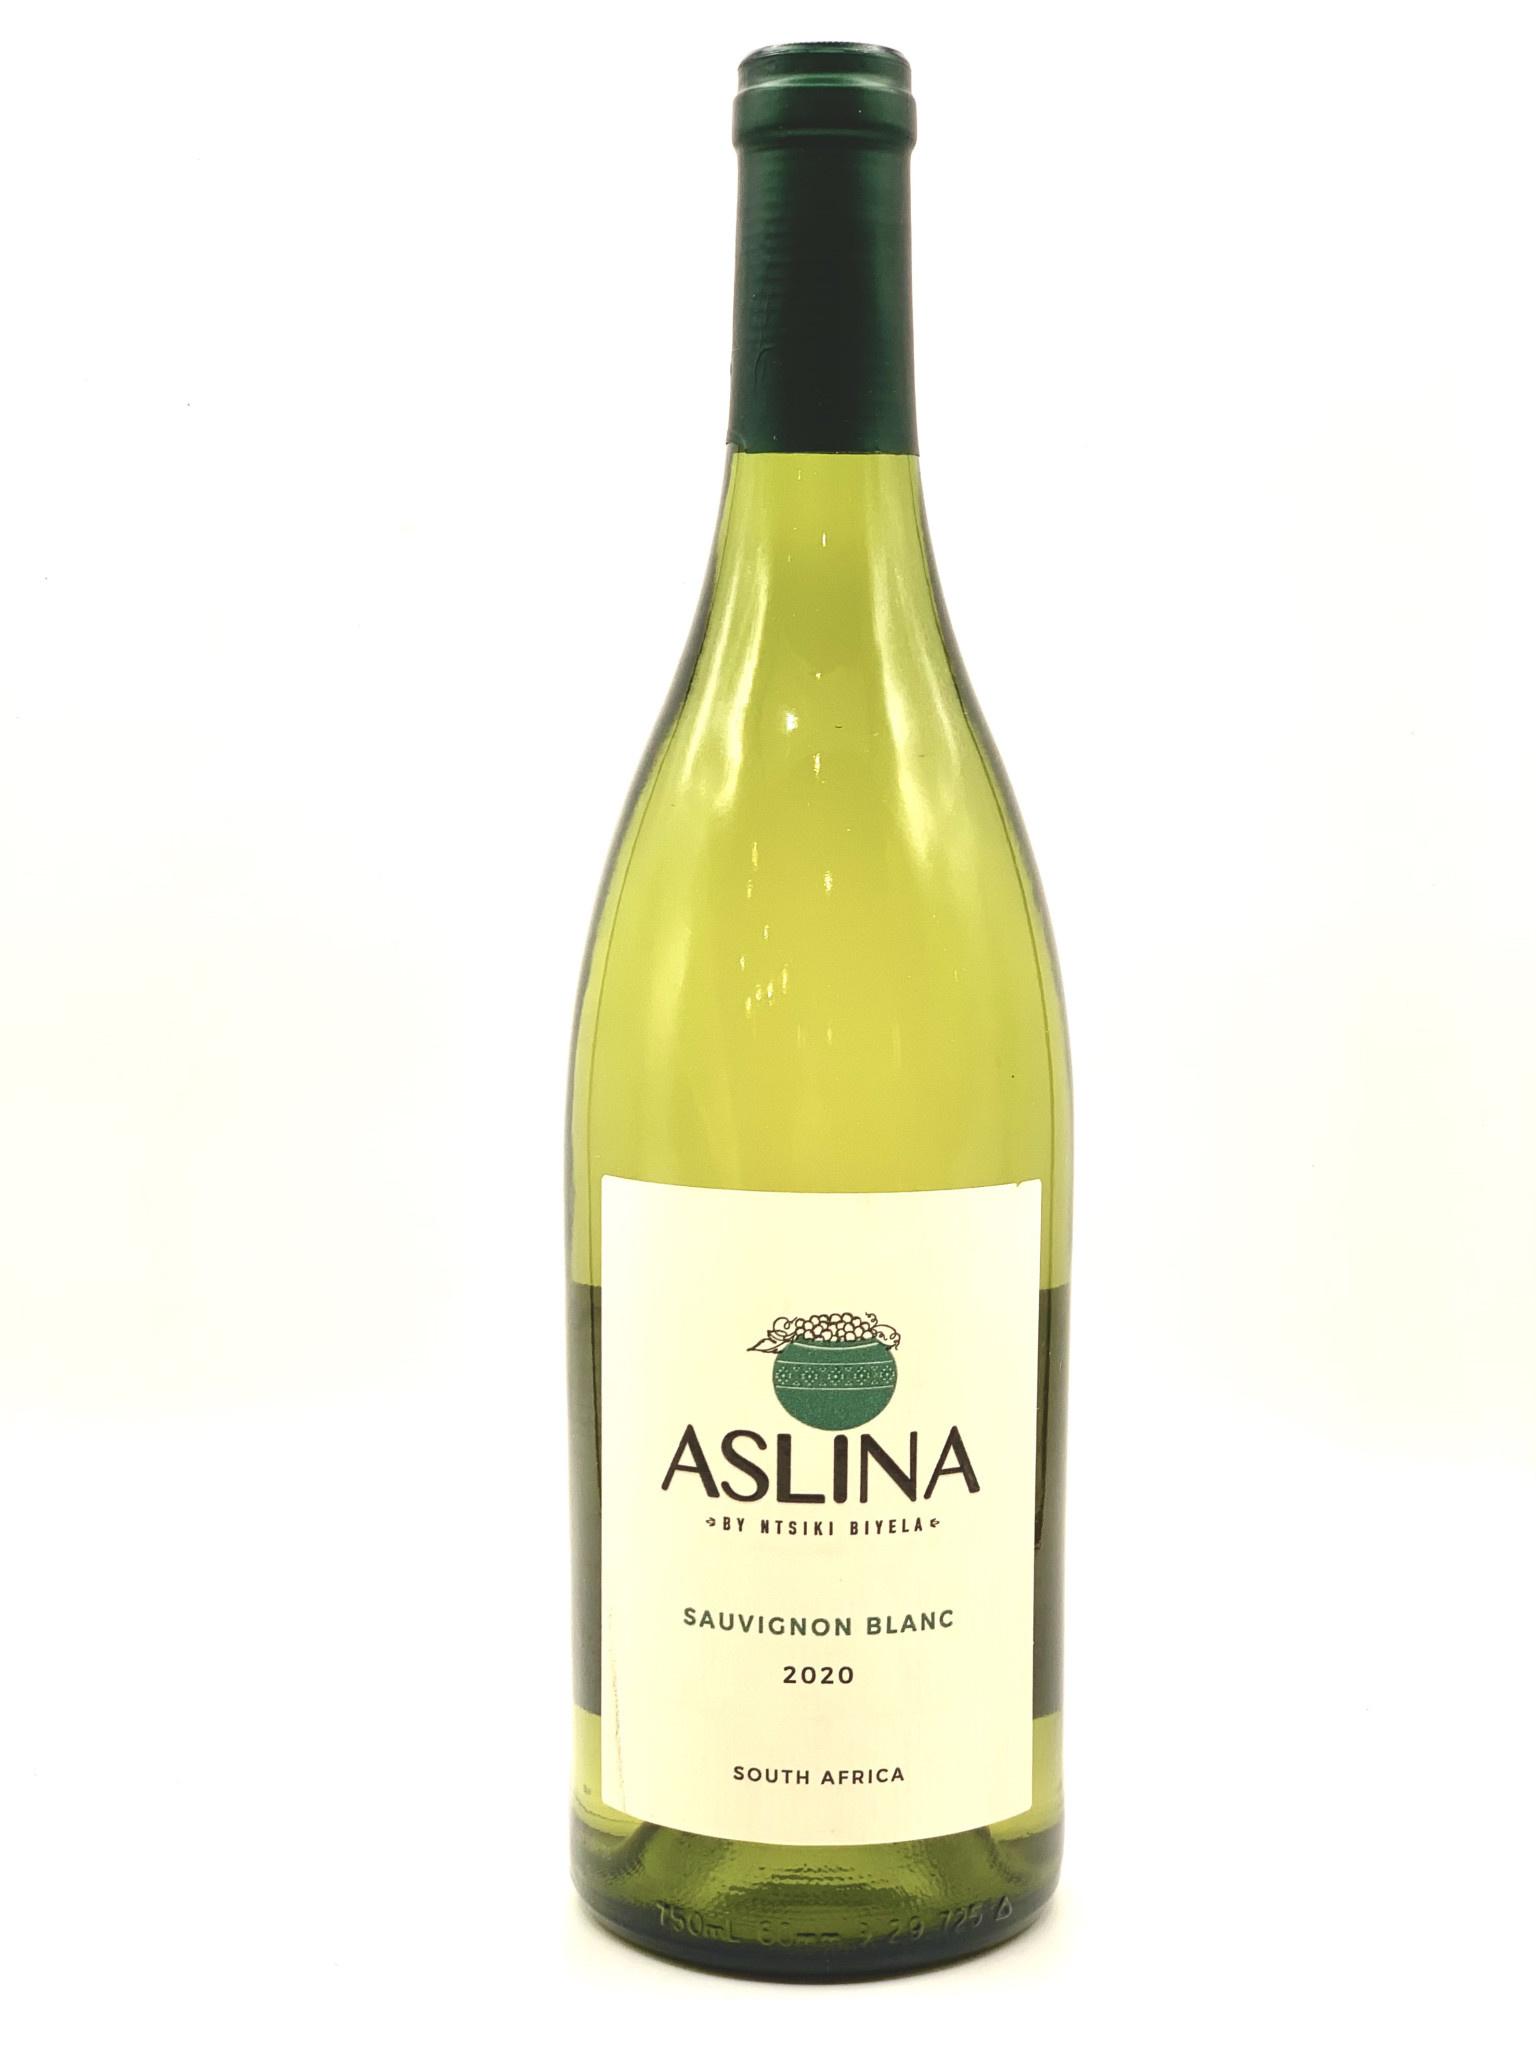 South African Sauvignon Blanc 2020 Aslina by Ntsiki Biyela  750ml